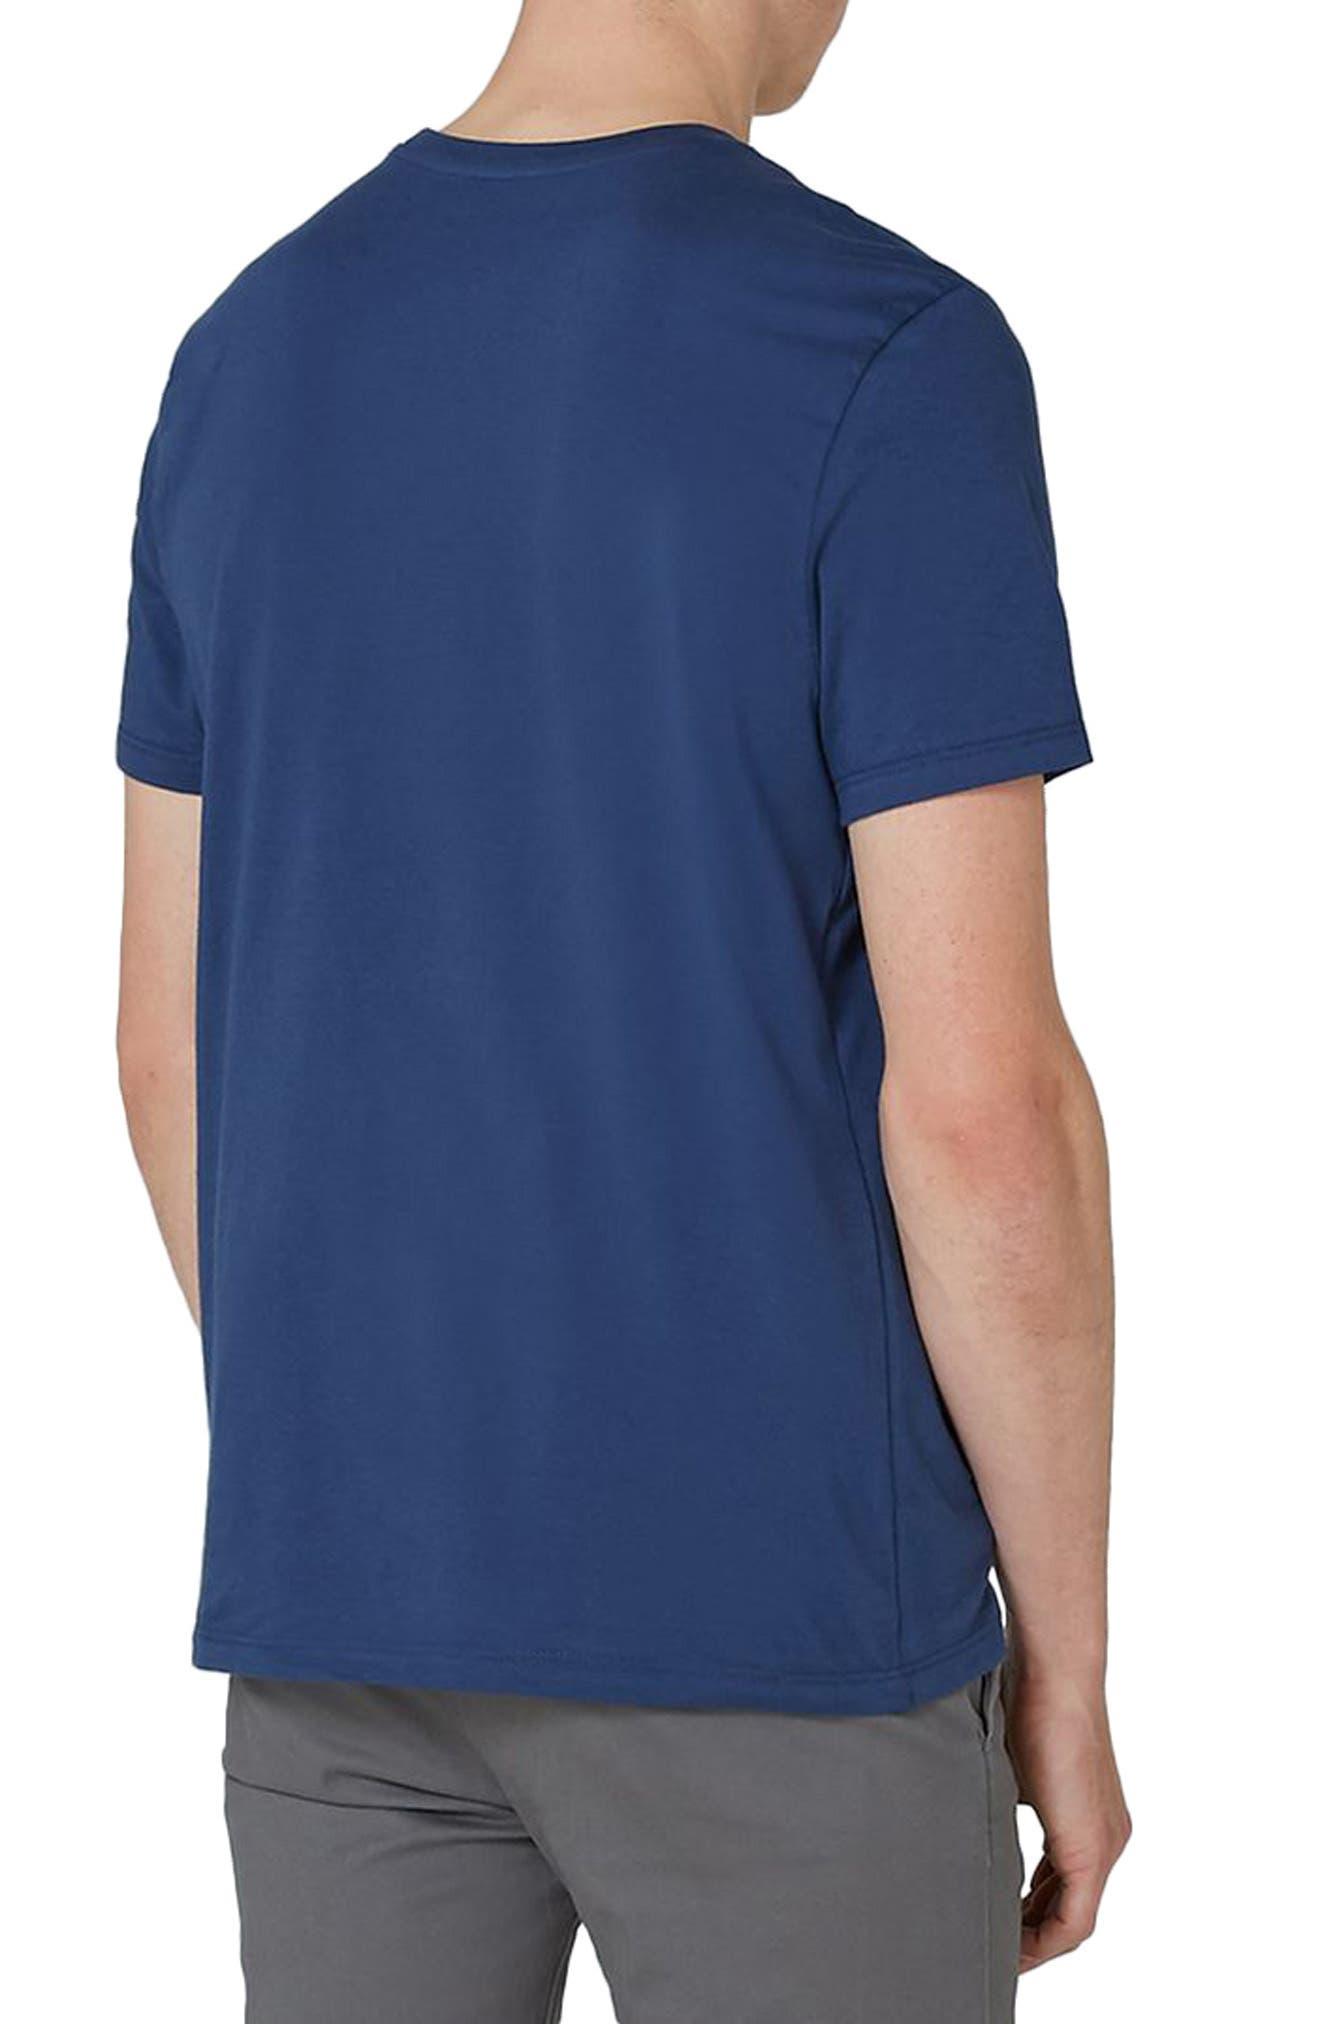 TOPMAN,                             Slim Fit Crewneck T-Shirt,                             Alternate thumbnail 2, color,                             450